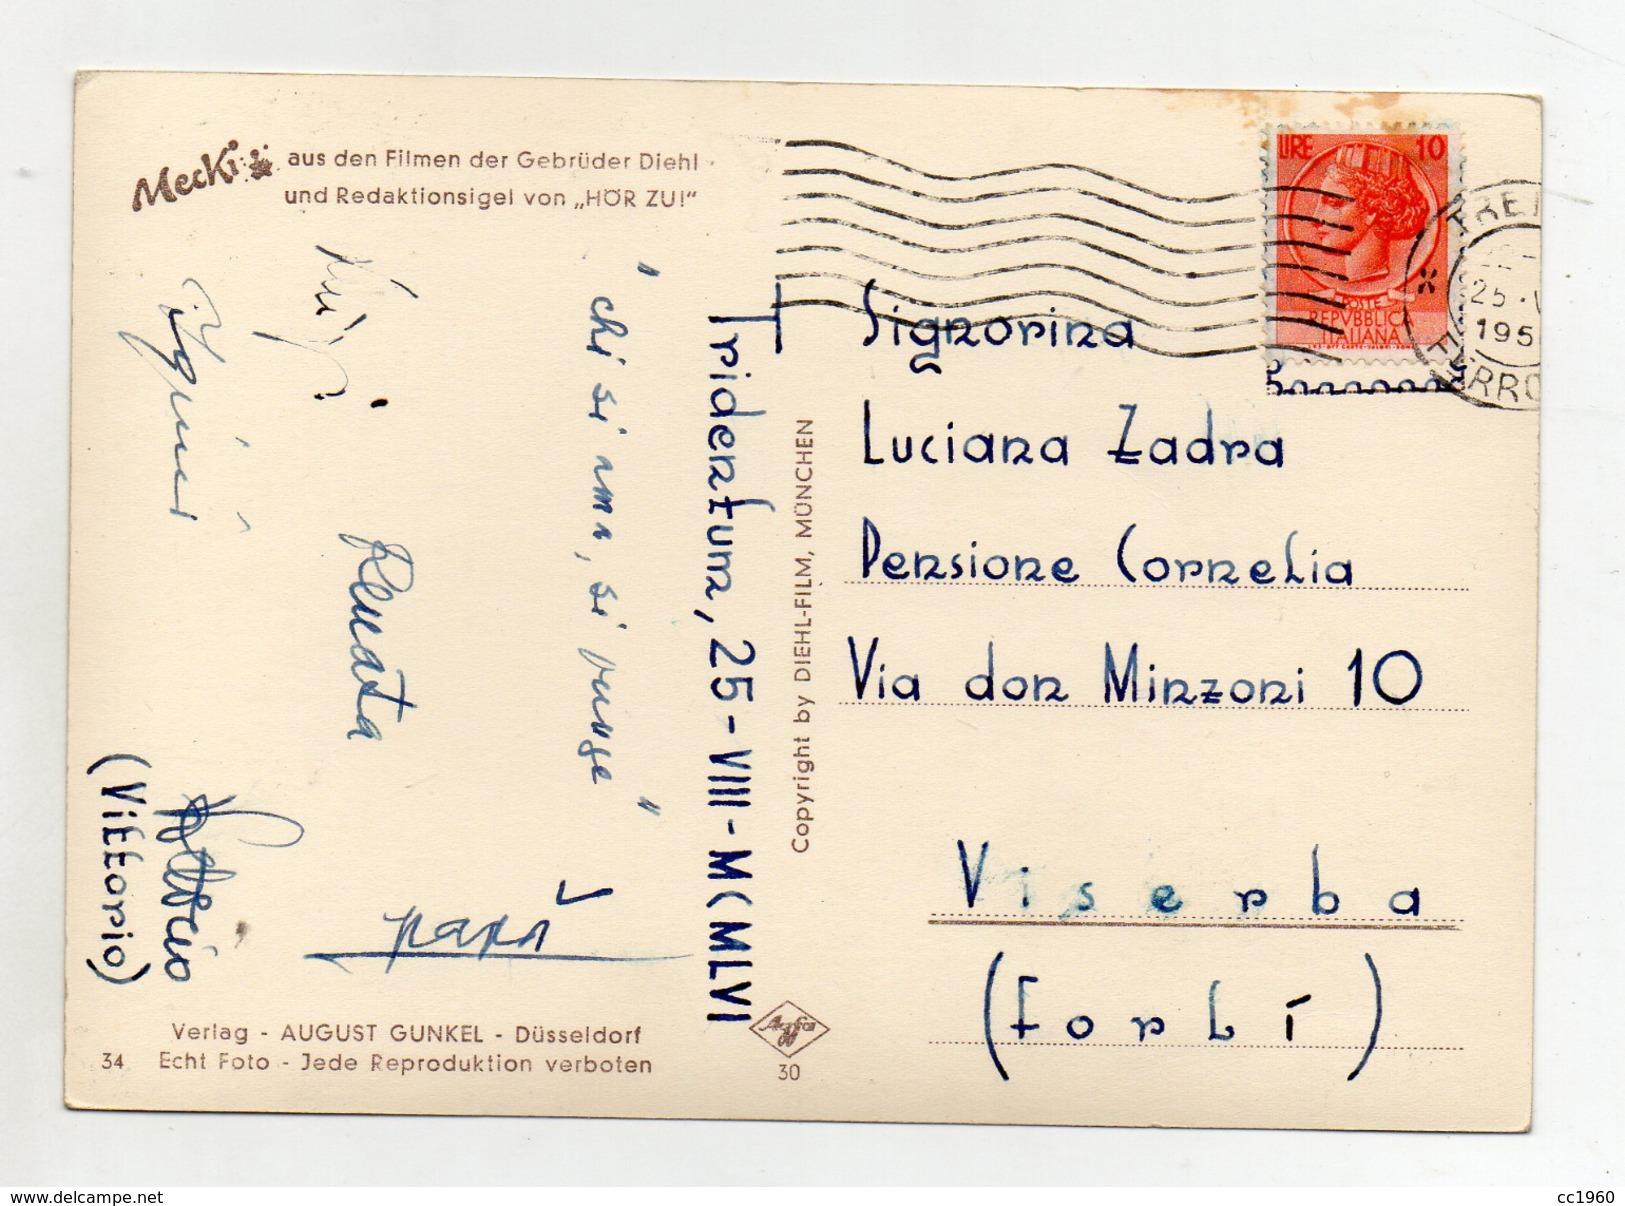 MECKI - Was Sich Liebt, Das Neckt Sich ! - Viaggiata Nel 1956 - (FDC3162) - Cartolina Nr. 34 - Mecki